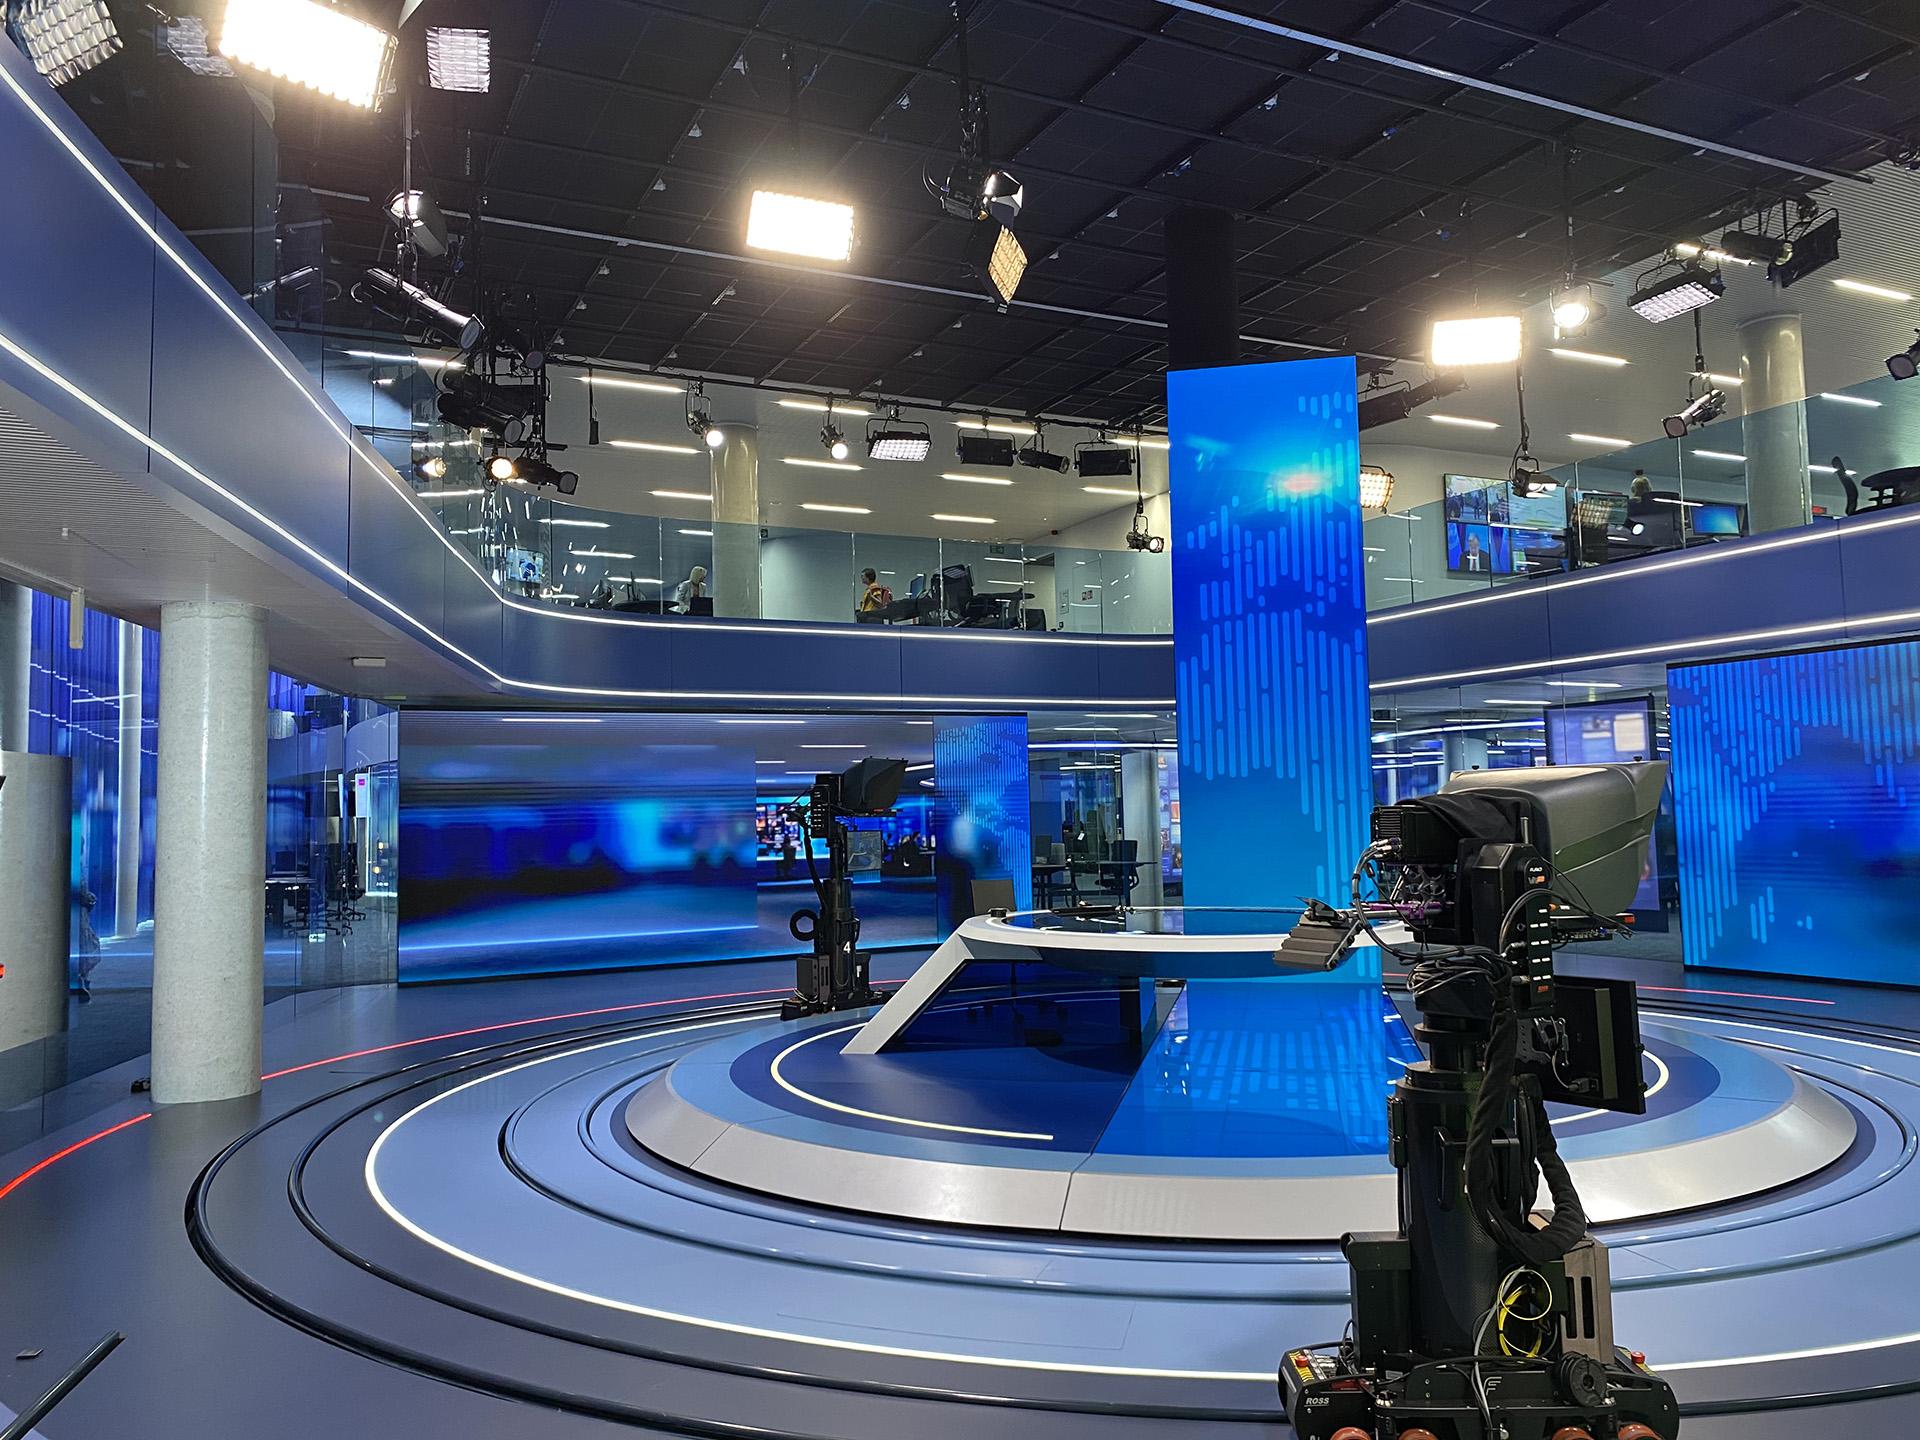 Eclpaneltwc_TV%20BELGA%20(5).JPG